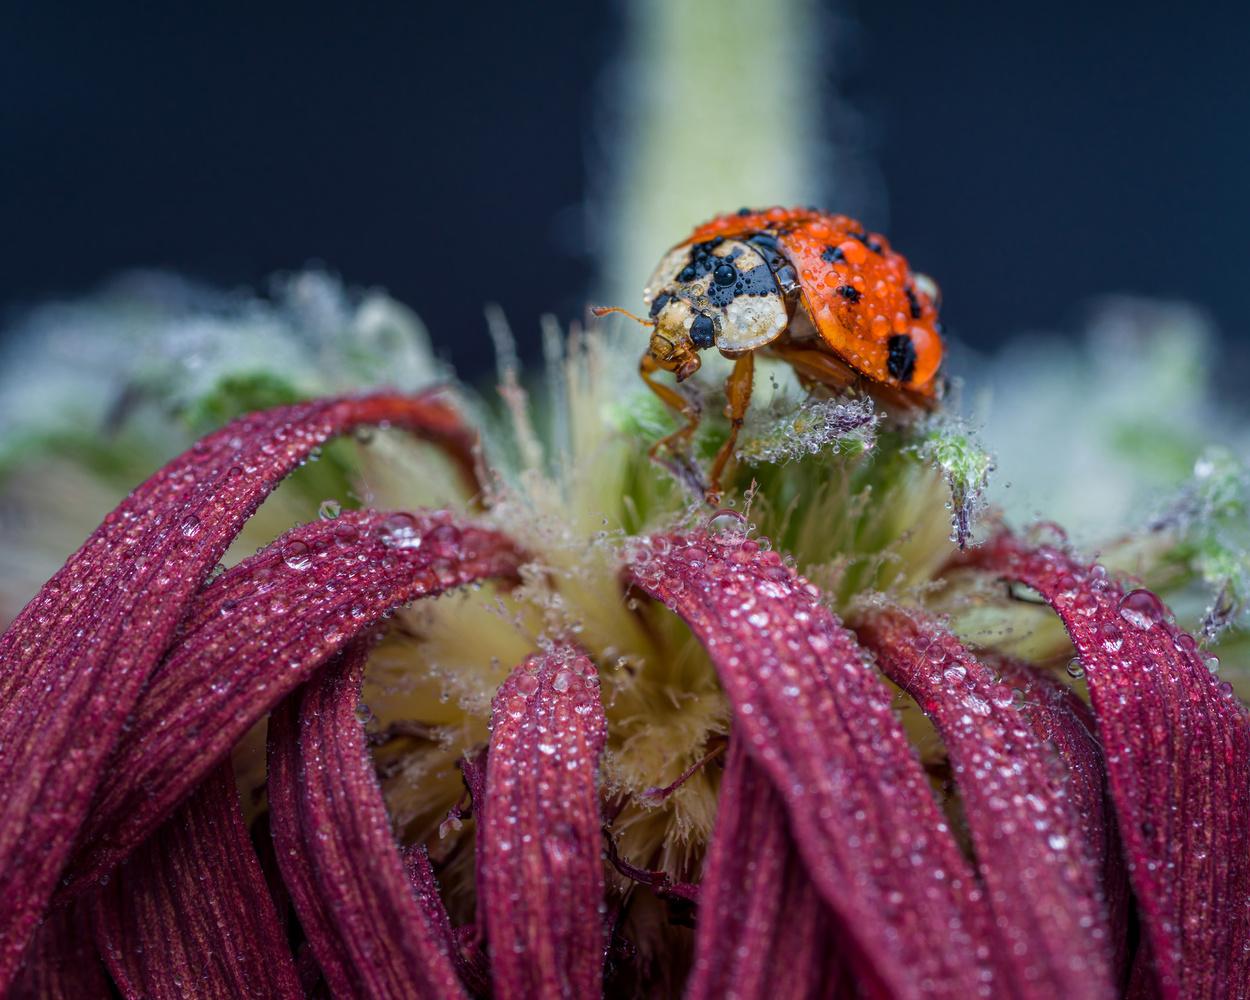 Ladybug by Skyler Ewing